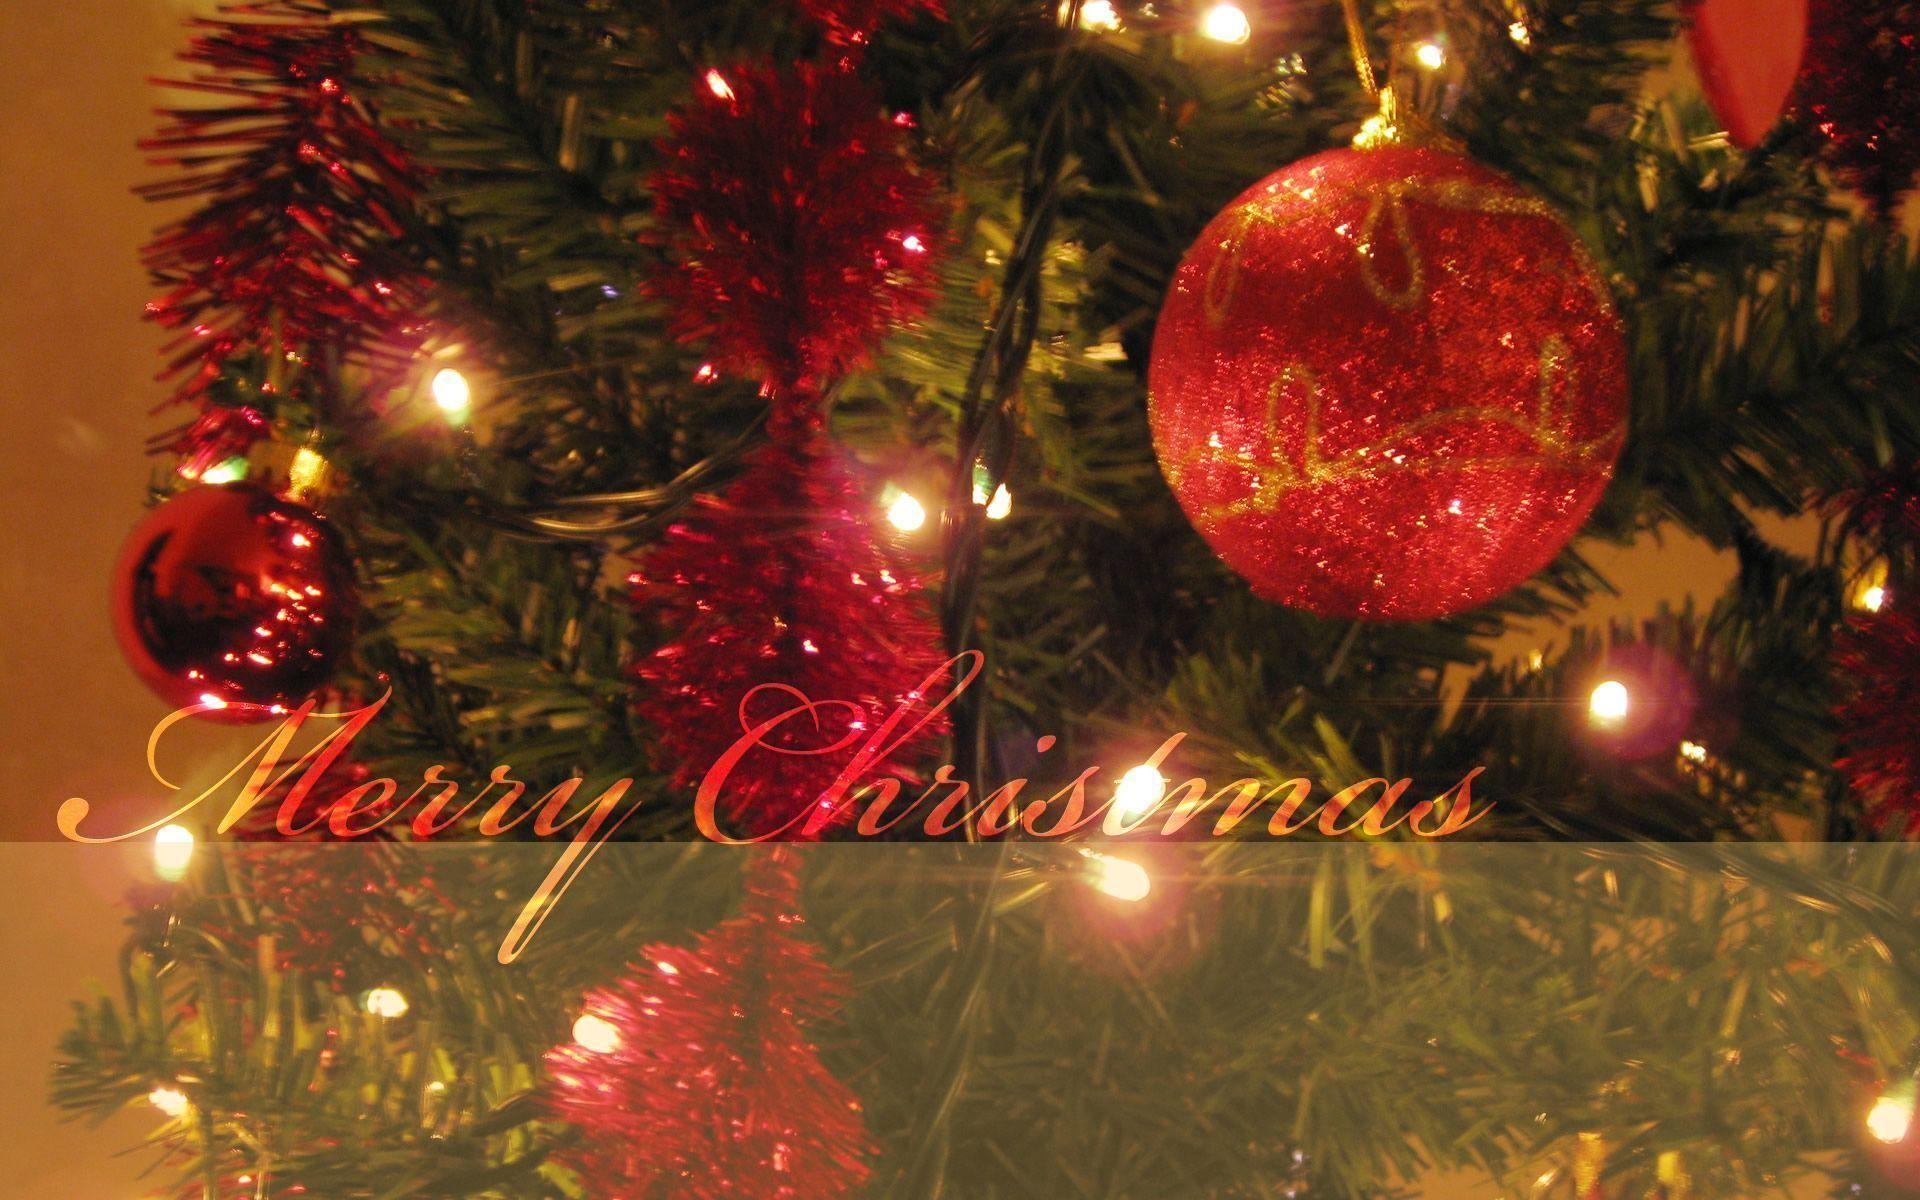 Wallpapers For > Christian Christmas Desktop Backgrounds